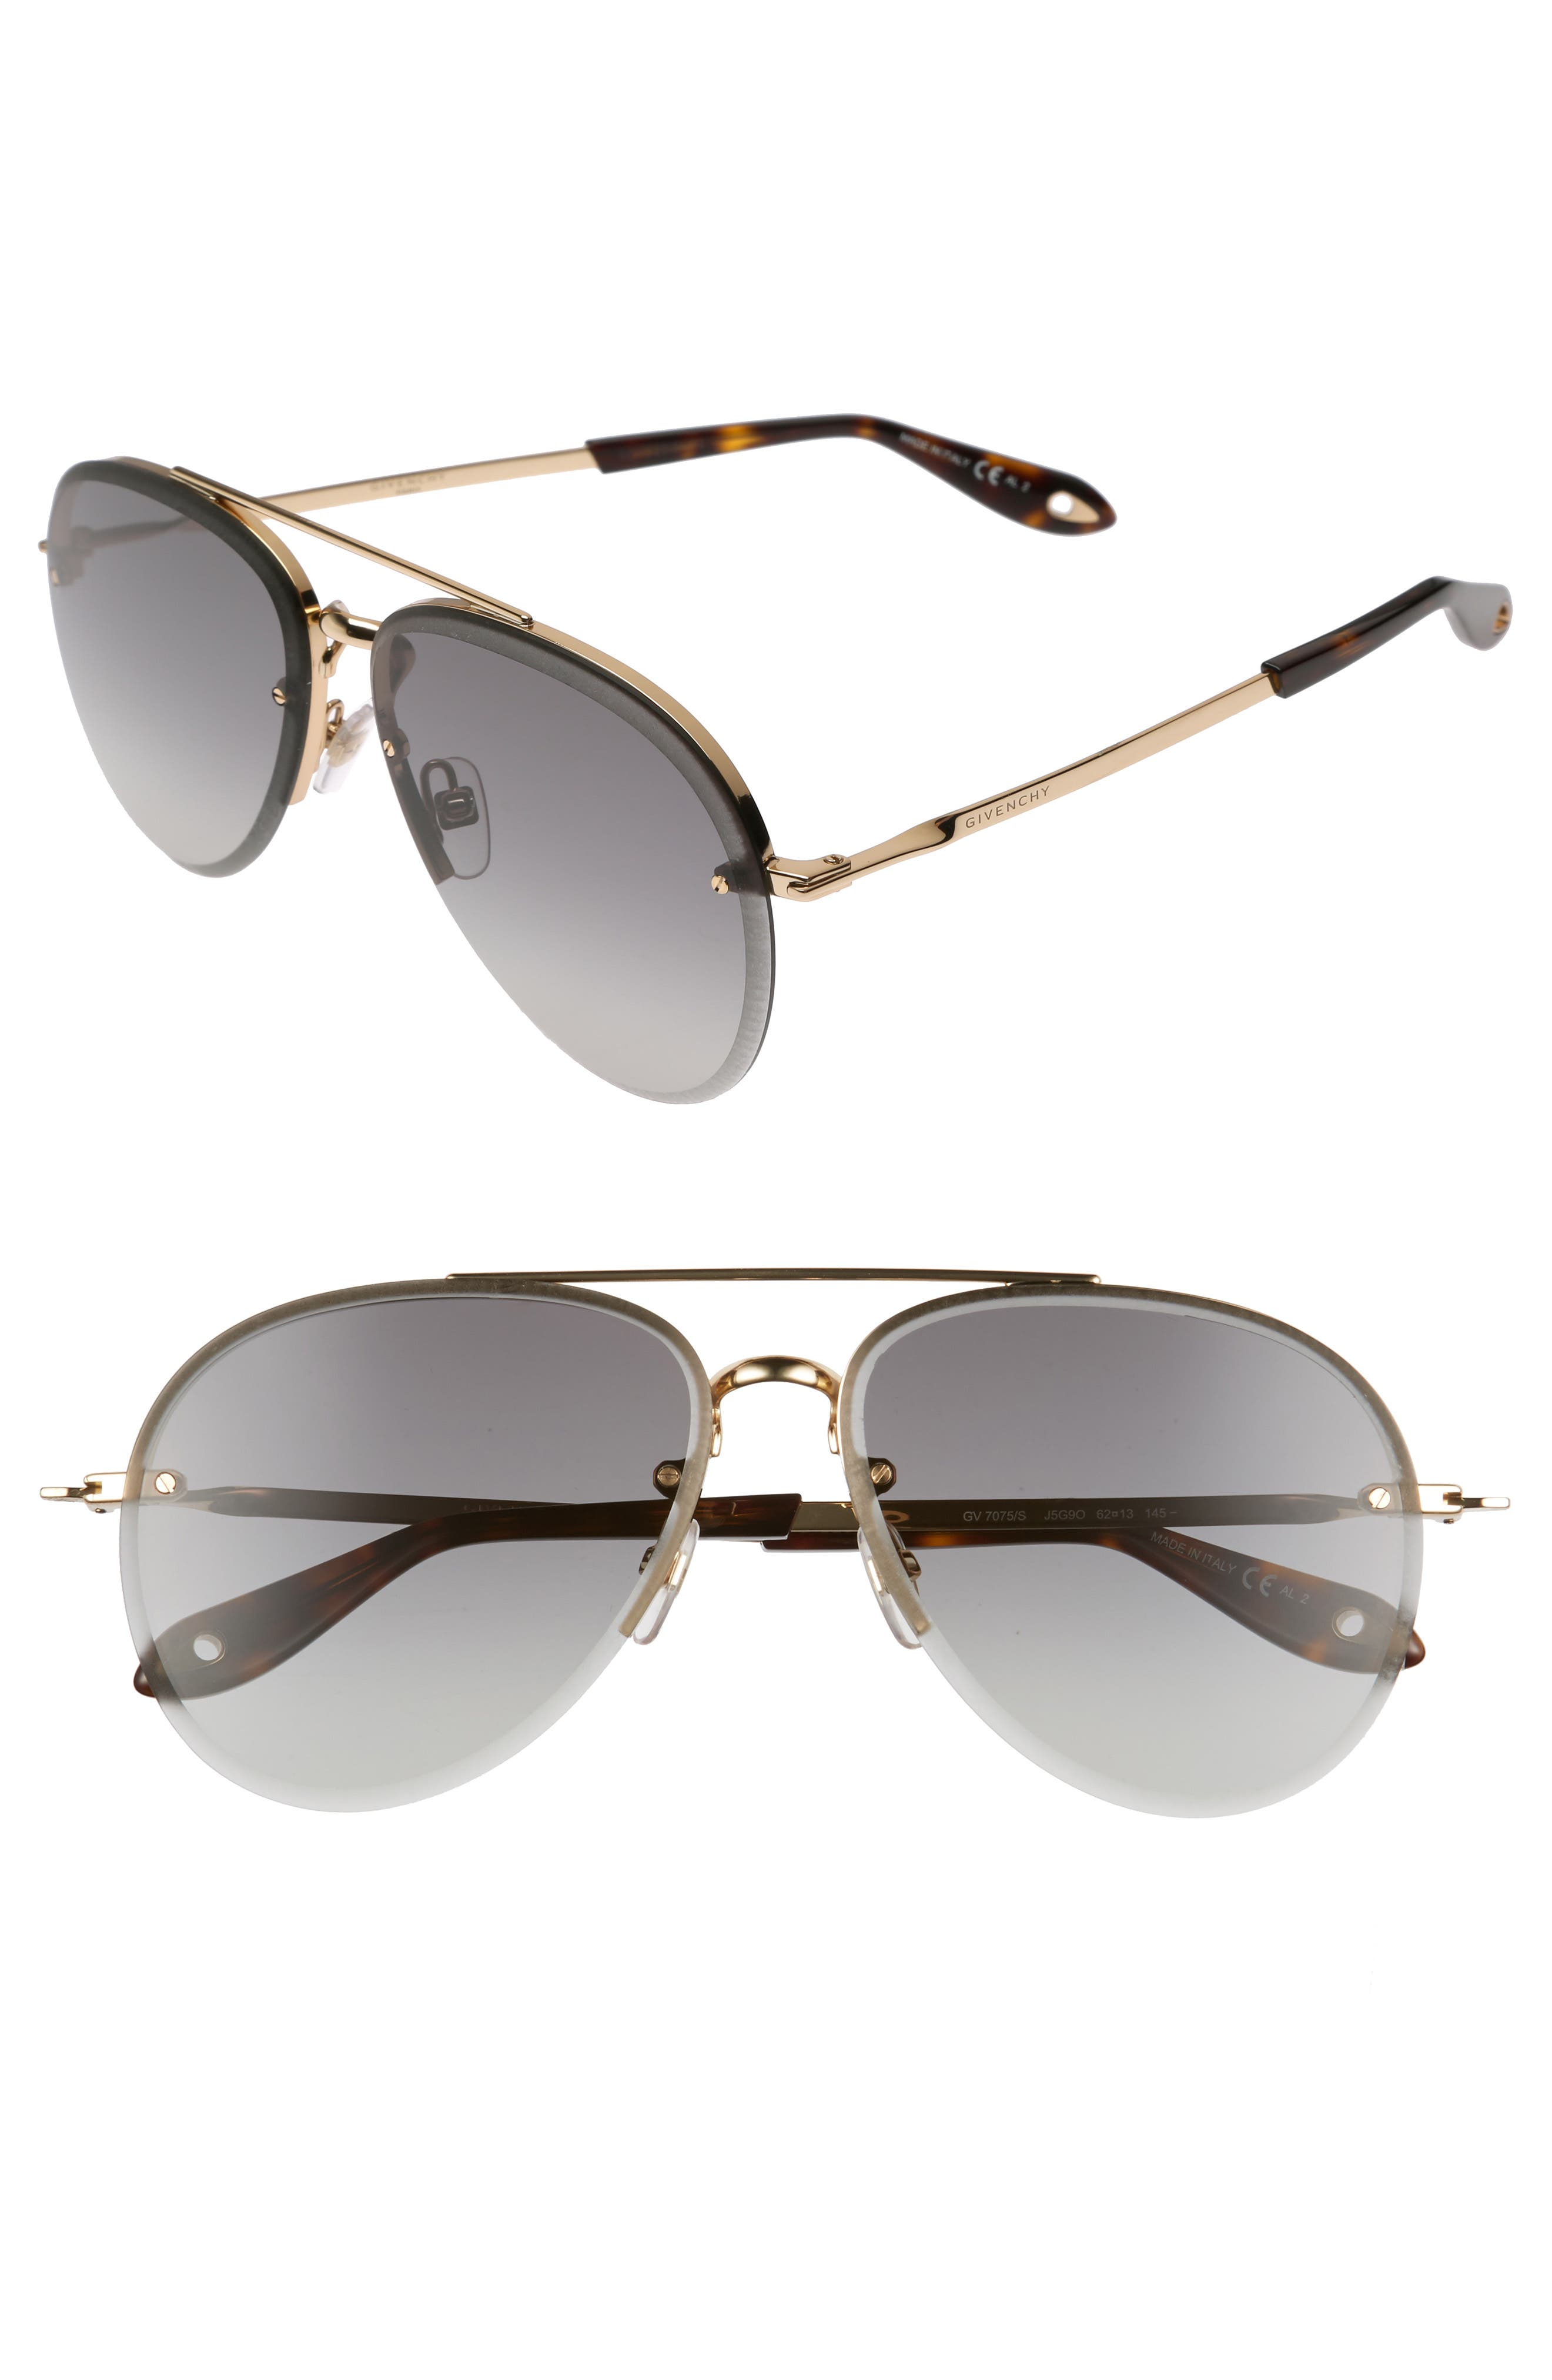 62mm Oversize Aviator Sunglasses,                             Main thumbnail 1, color,                             Gold